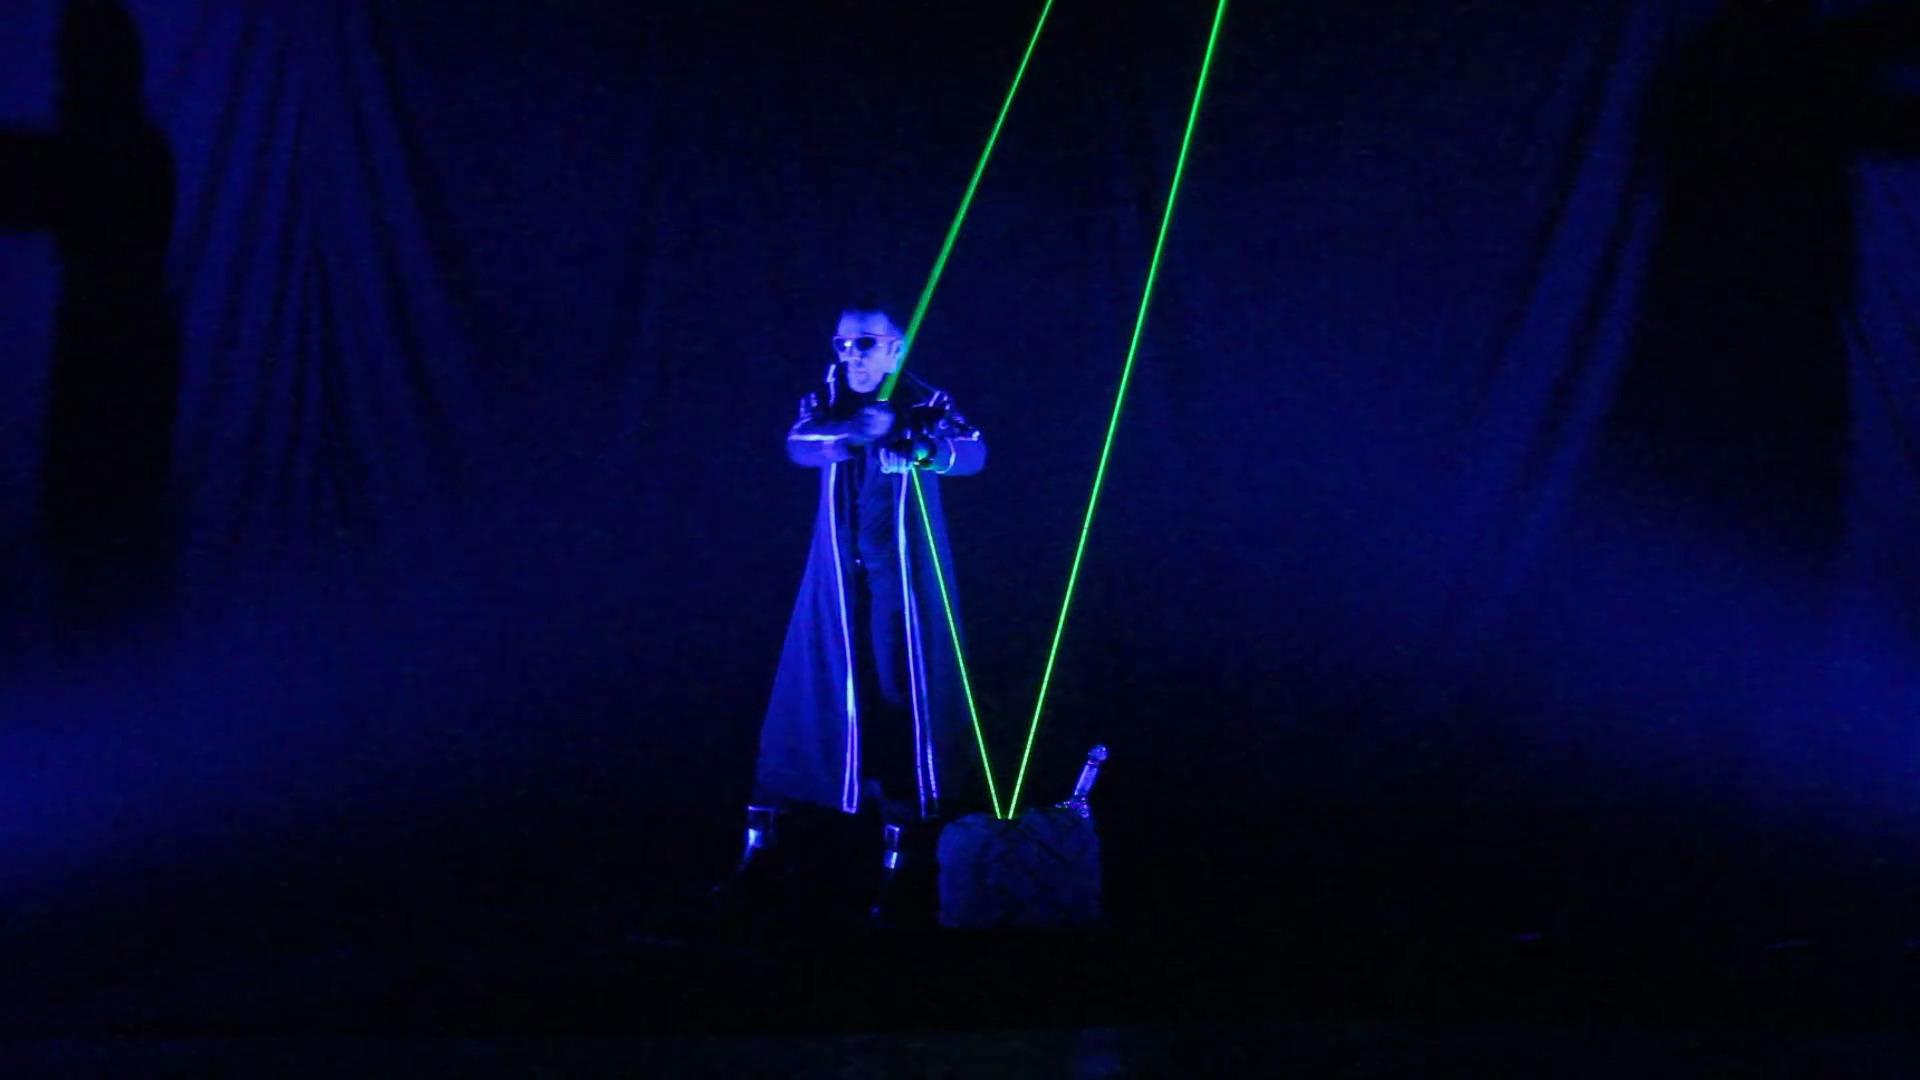 Video: Laserman-Show